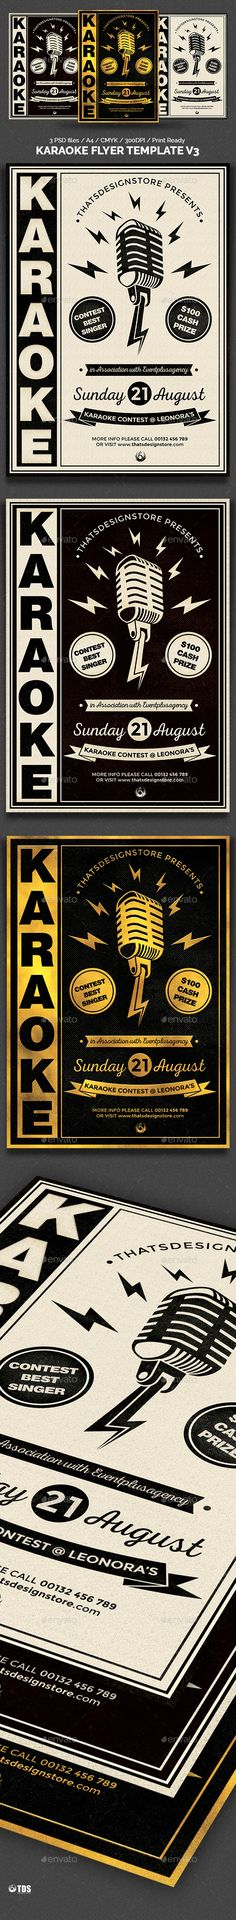 Karaoke Flyer Template V3 — Photoshop PSD #club #band • Available here → https://graphicriver.net/item/karaoke-flyer-template-v3/12897018?ref=pxcr